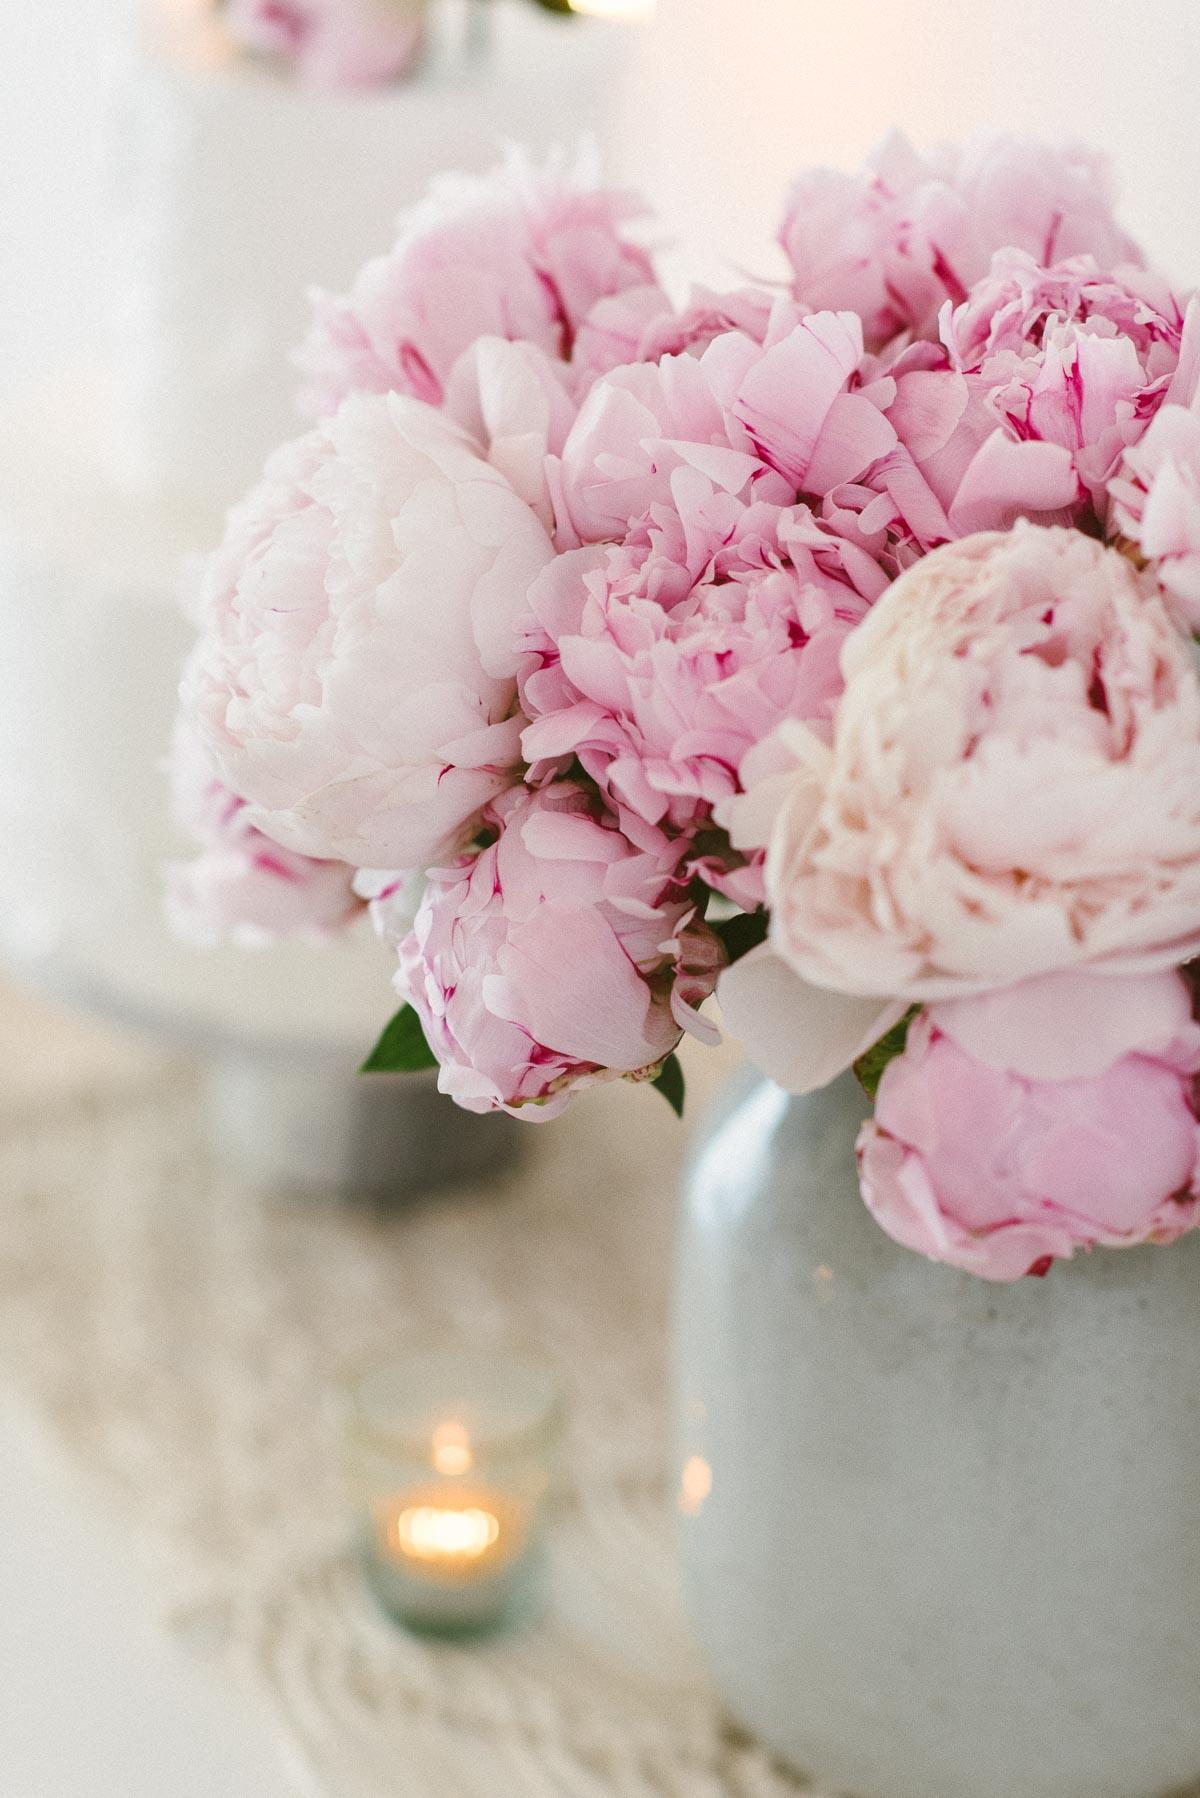 üppige rosa Pfingstrosen im Brautstrauß